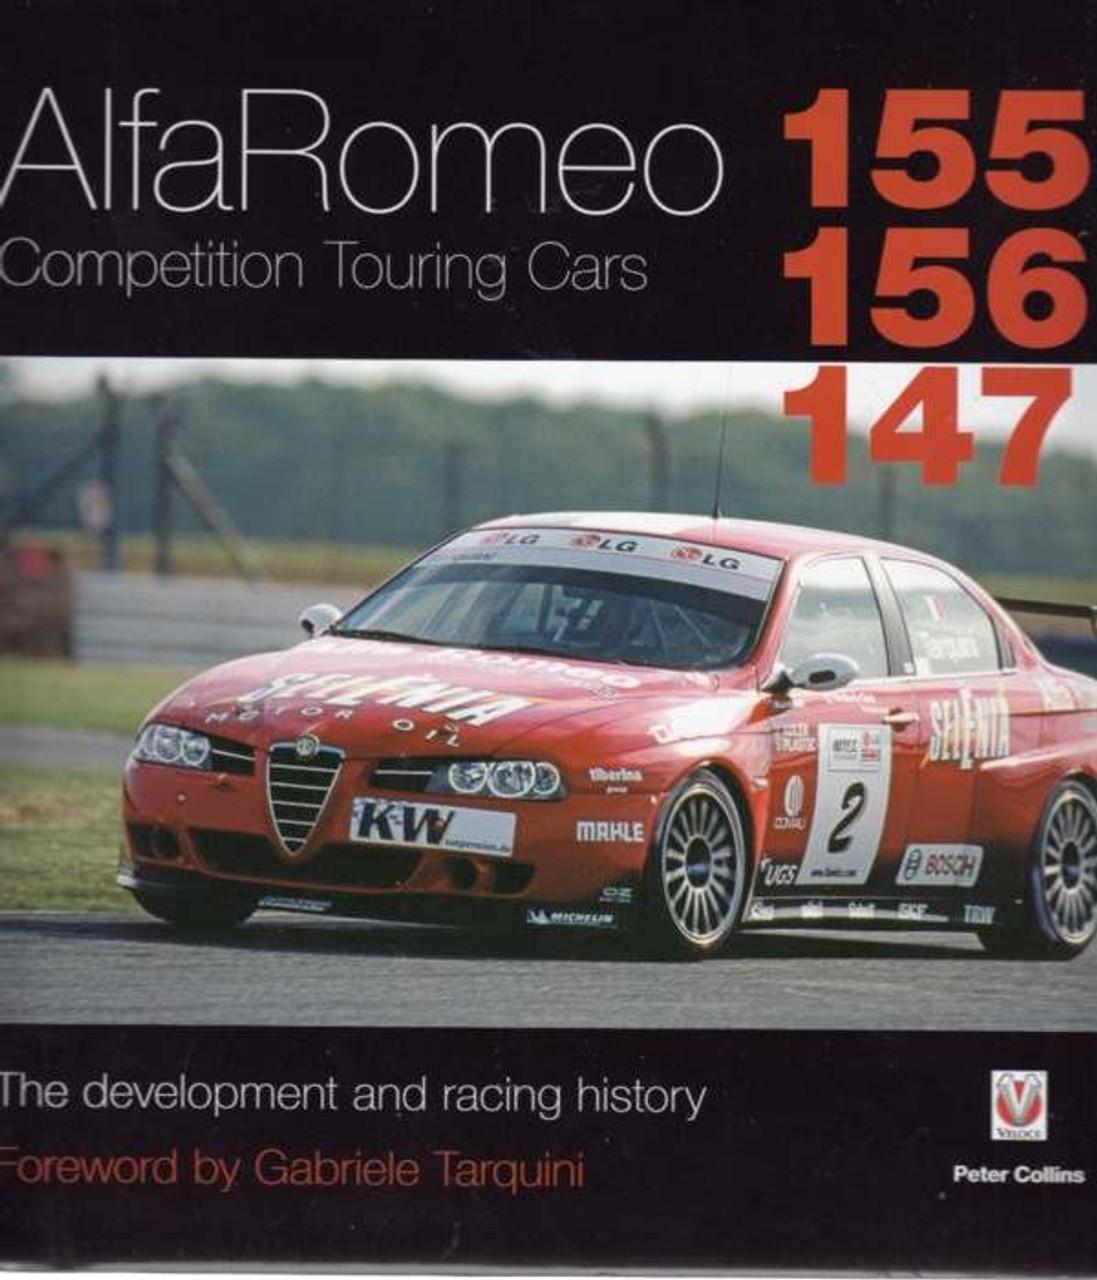 Alfa Romeo Competition Touring Cars 155, 156, 147